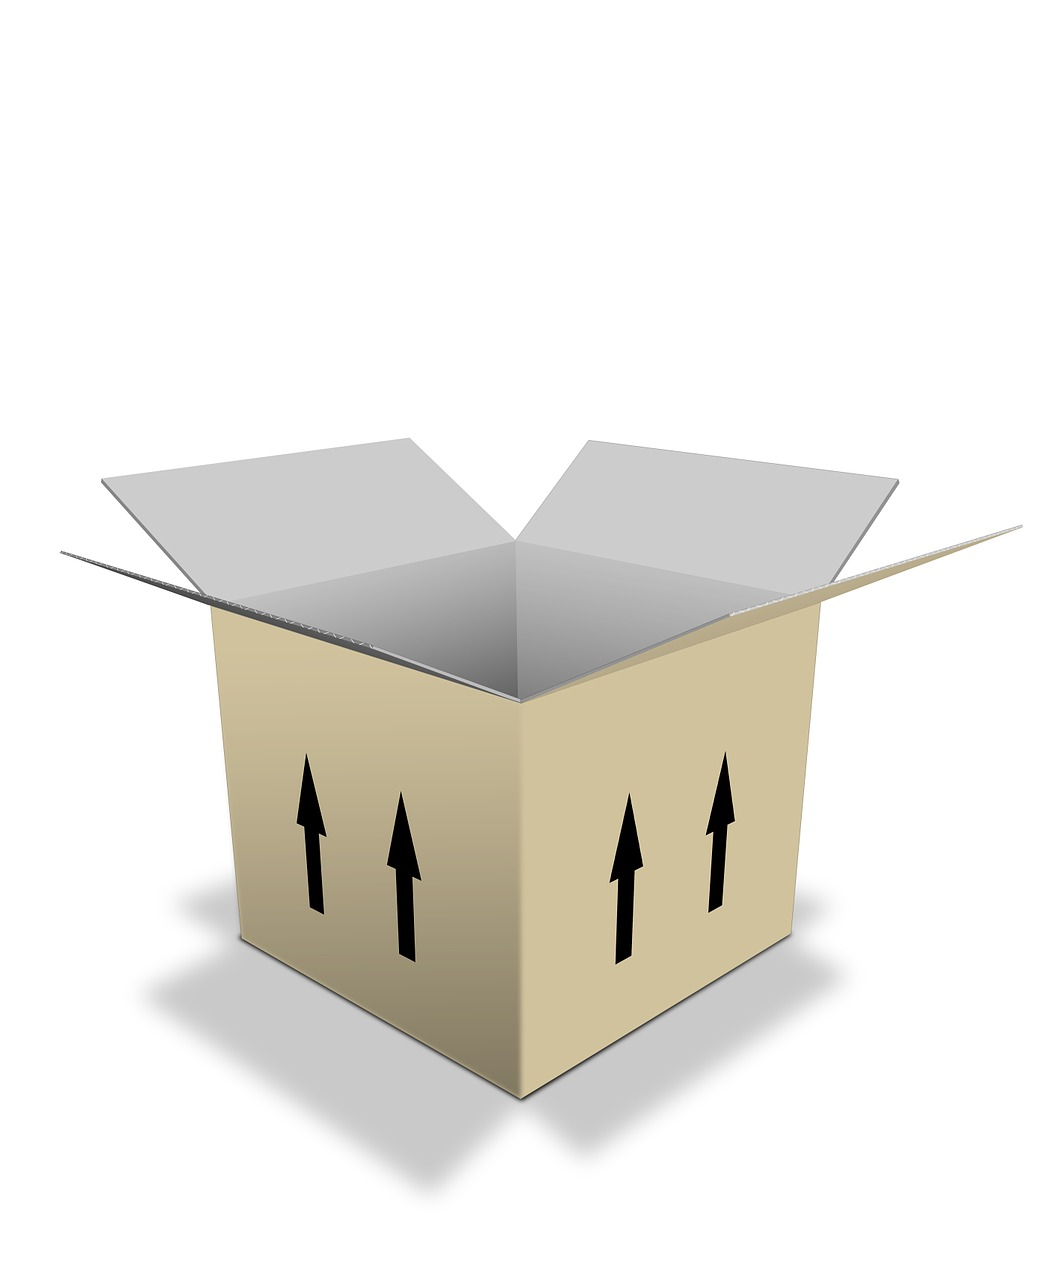 box, packing, cardboard